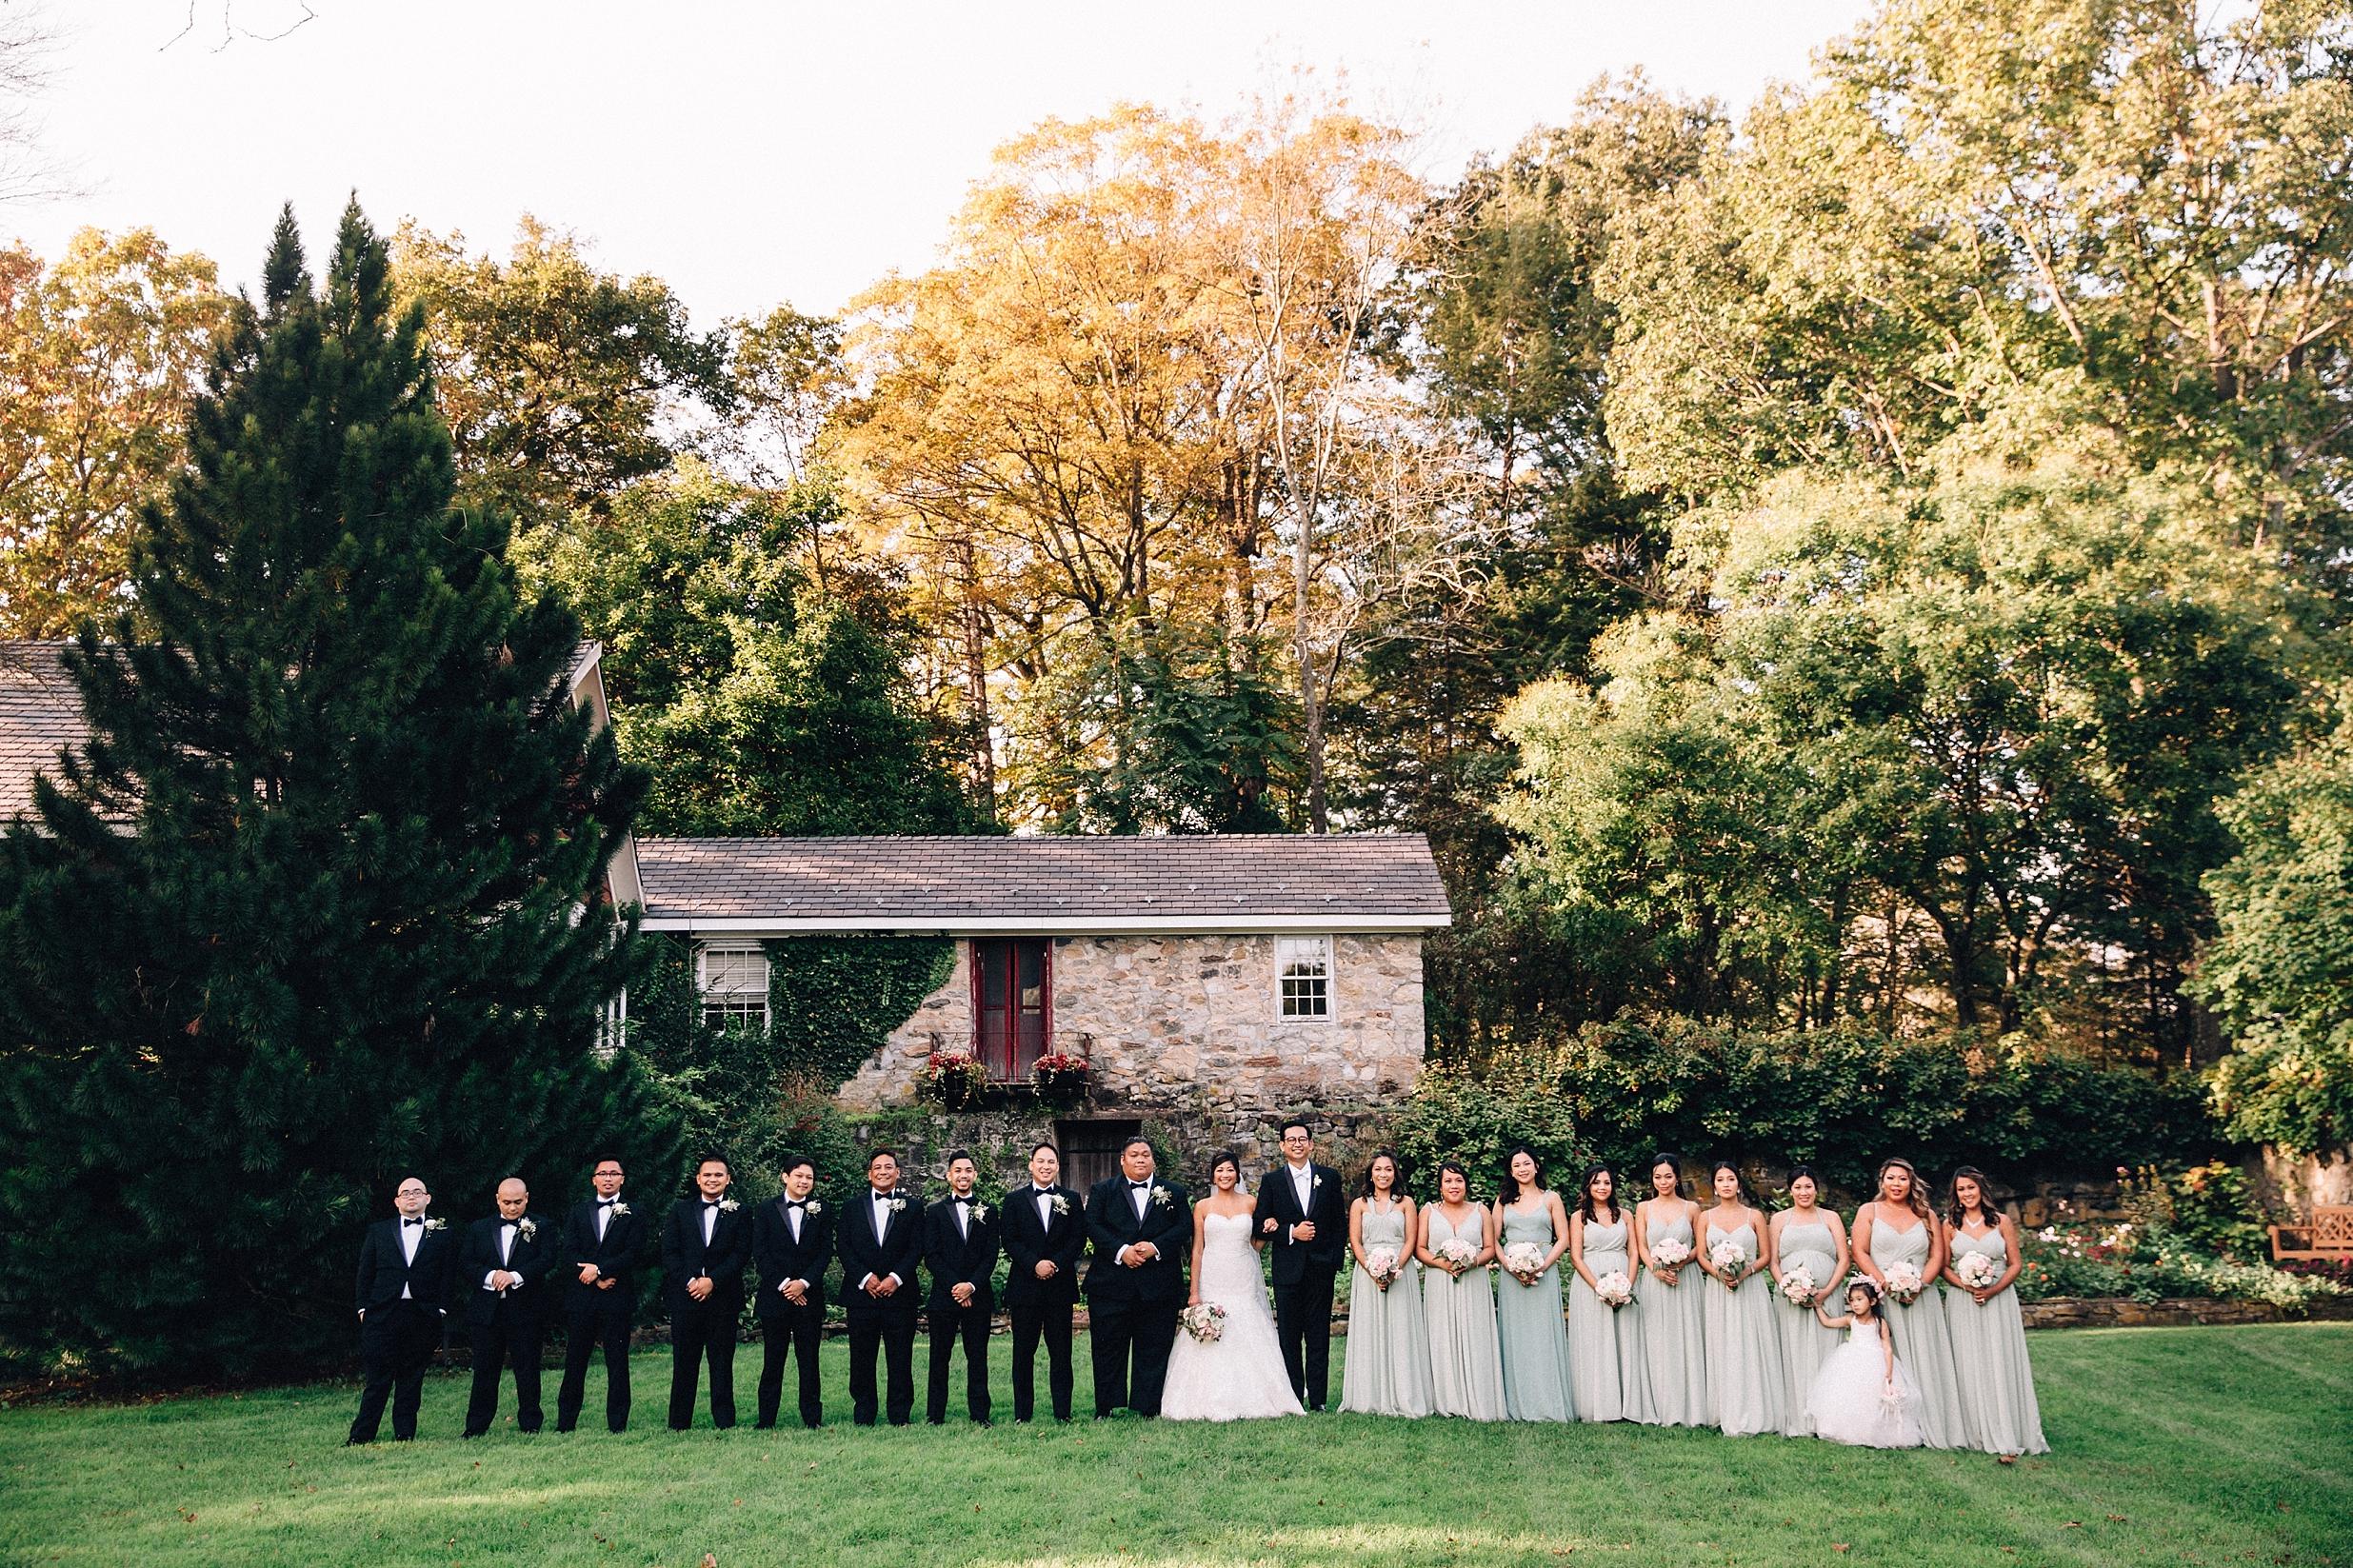 crossed-keys-estate-filipino-wedding-nj_0101.jpg